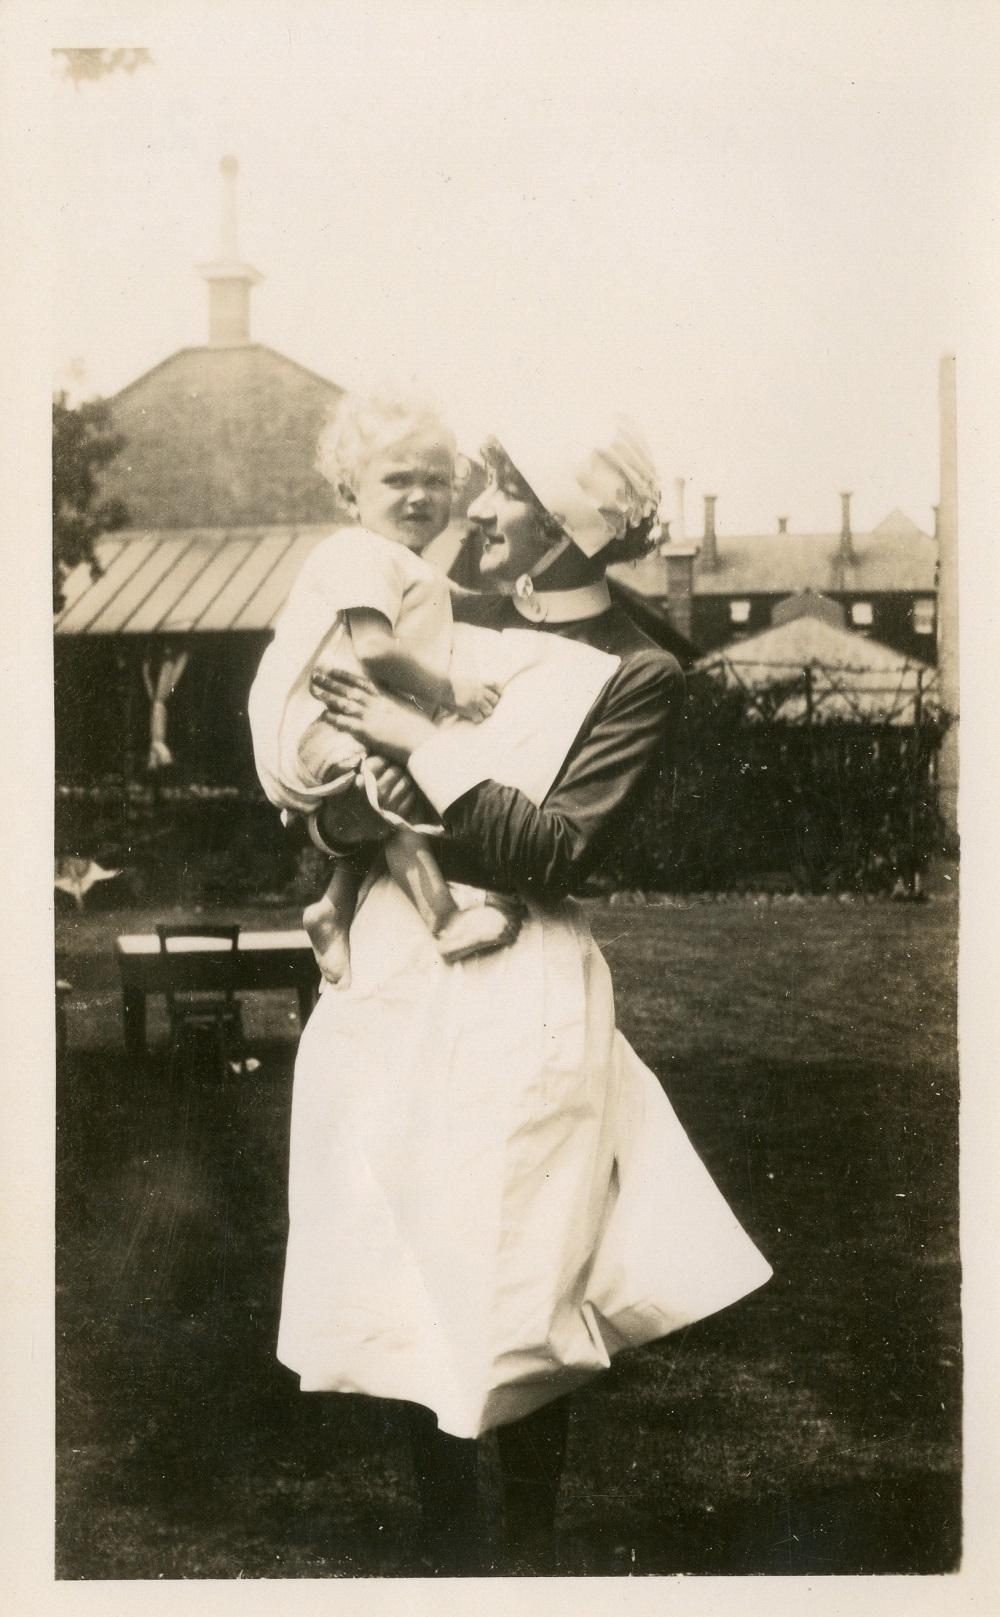 Nurse holding a baby, c. 1920s